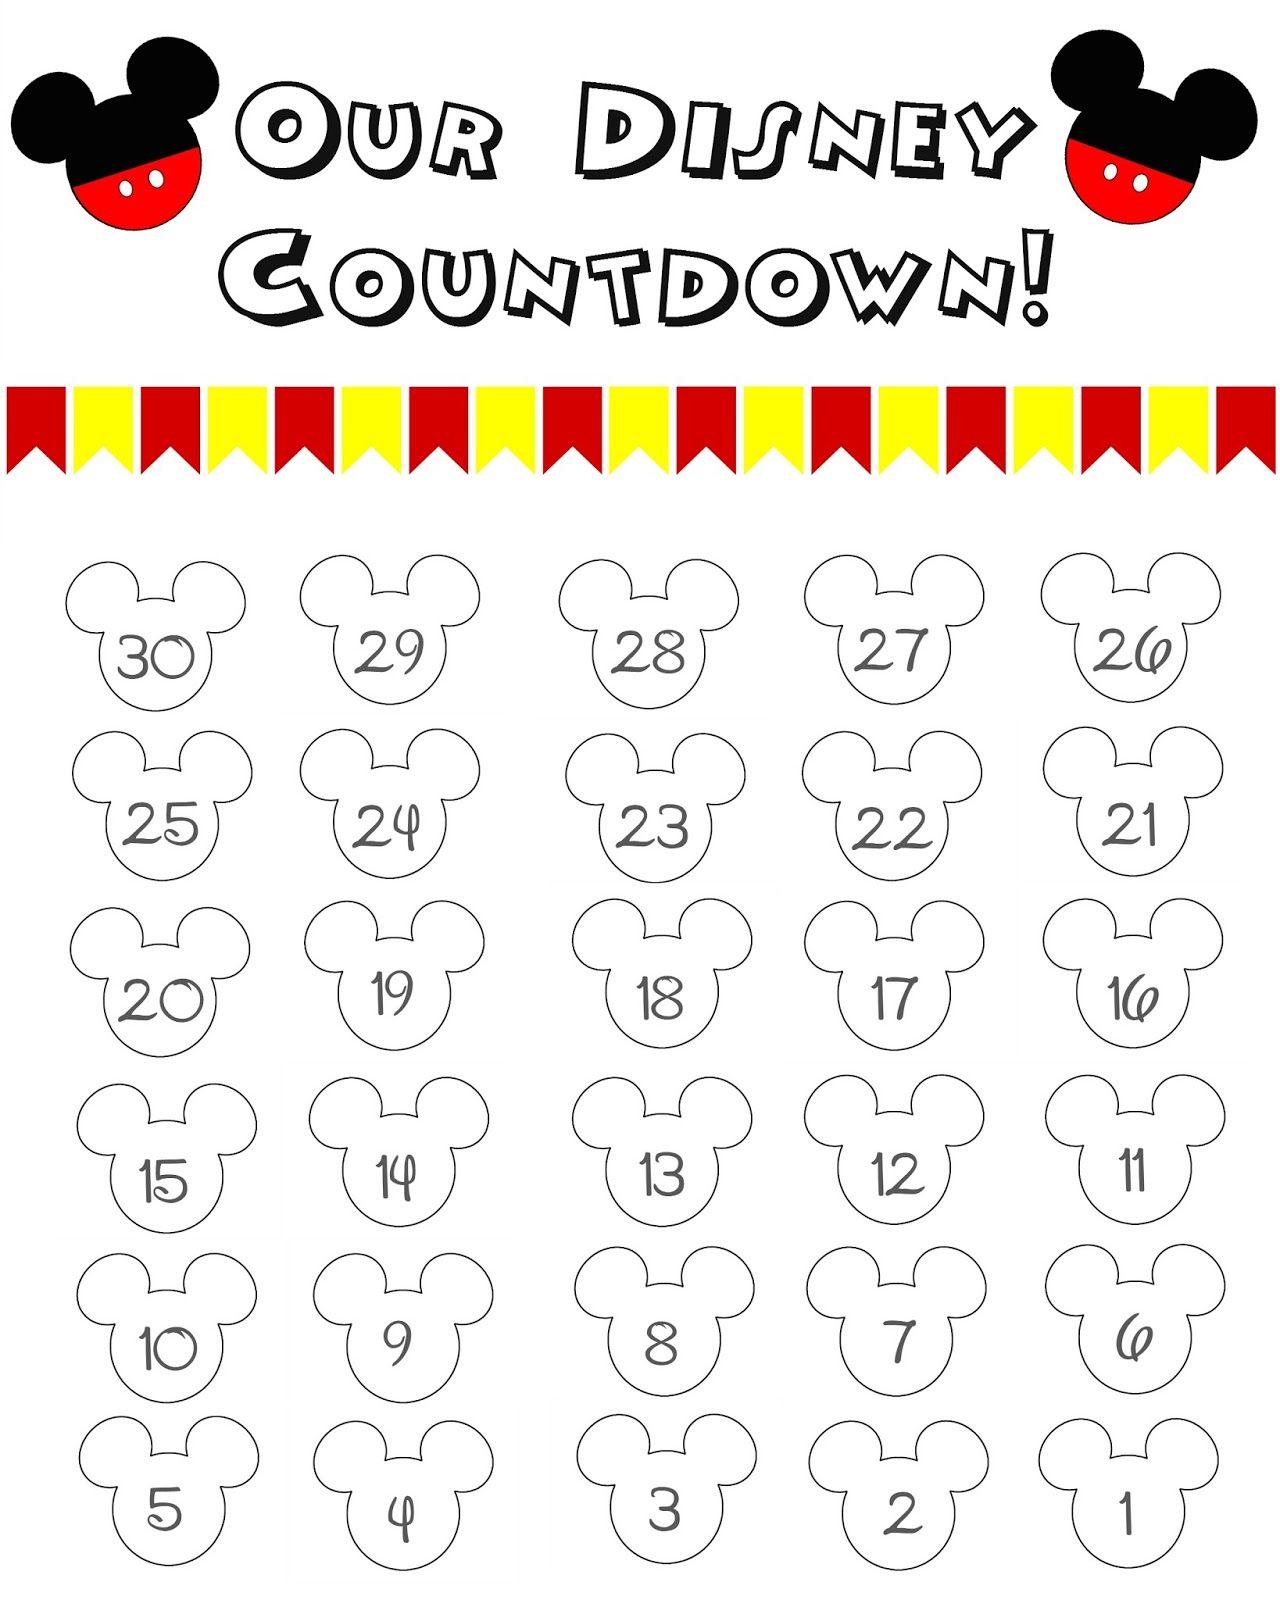 Disney World Countdown Calendar - Free Printable | The Momma